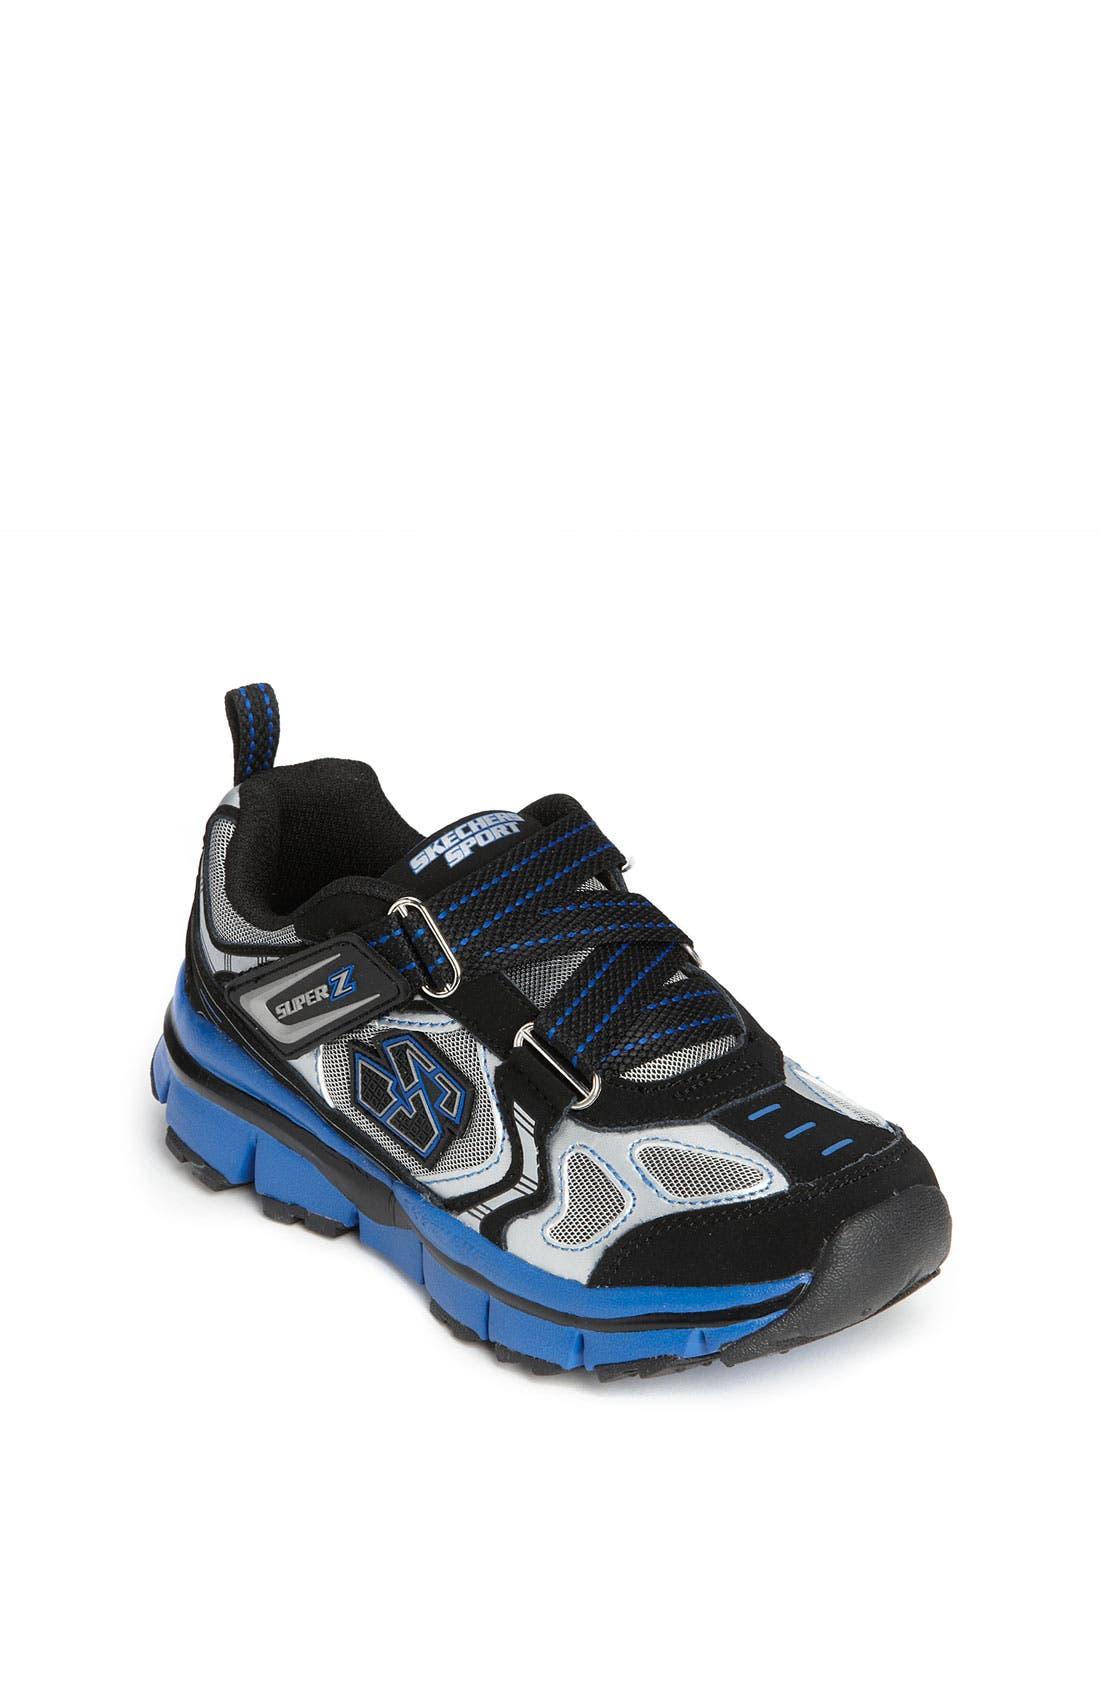 Main Image - SKECHERS 'Extreme Flex' Sneaker (Toddler, Little Kid & Big Kid)